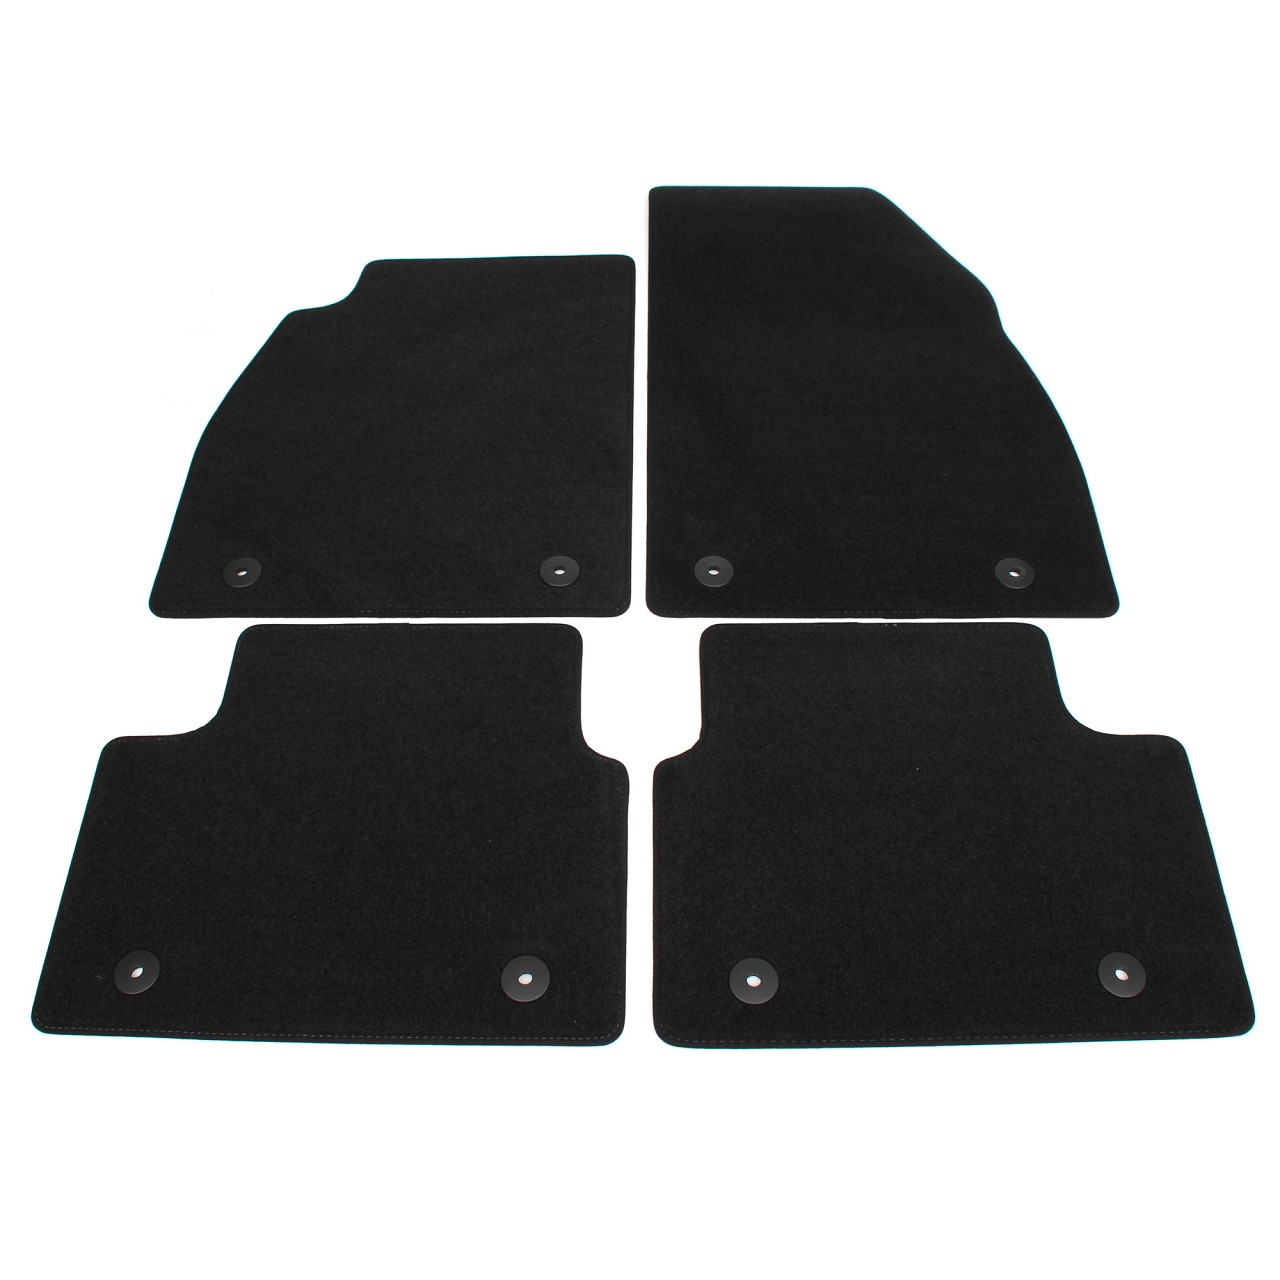 ORIGINAL Opel Textilmatten Fußmatten Automatten Satz INSIGNIA 4-tlg 13434820